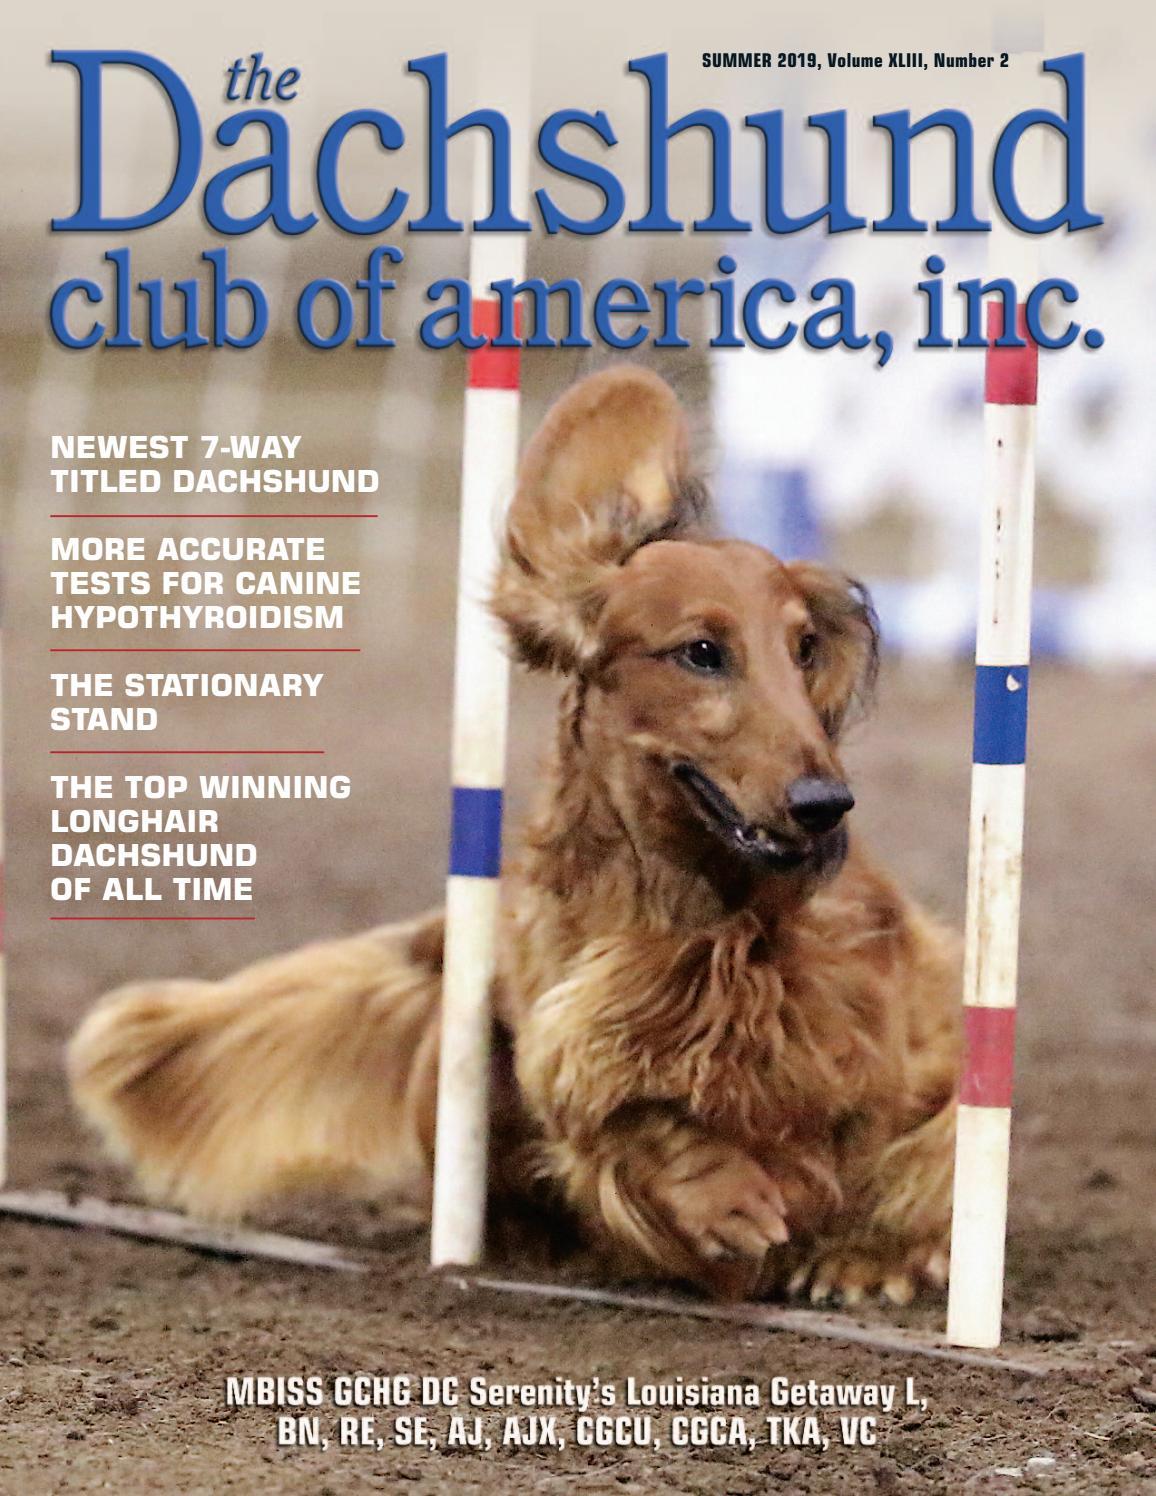 Labrador Retriever Dog Pewter Zipper Pull Mum Dad Vet Christmas Useful Gift NEW